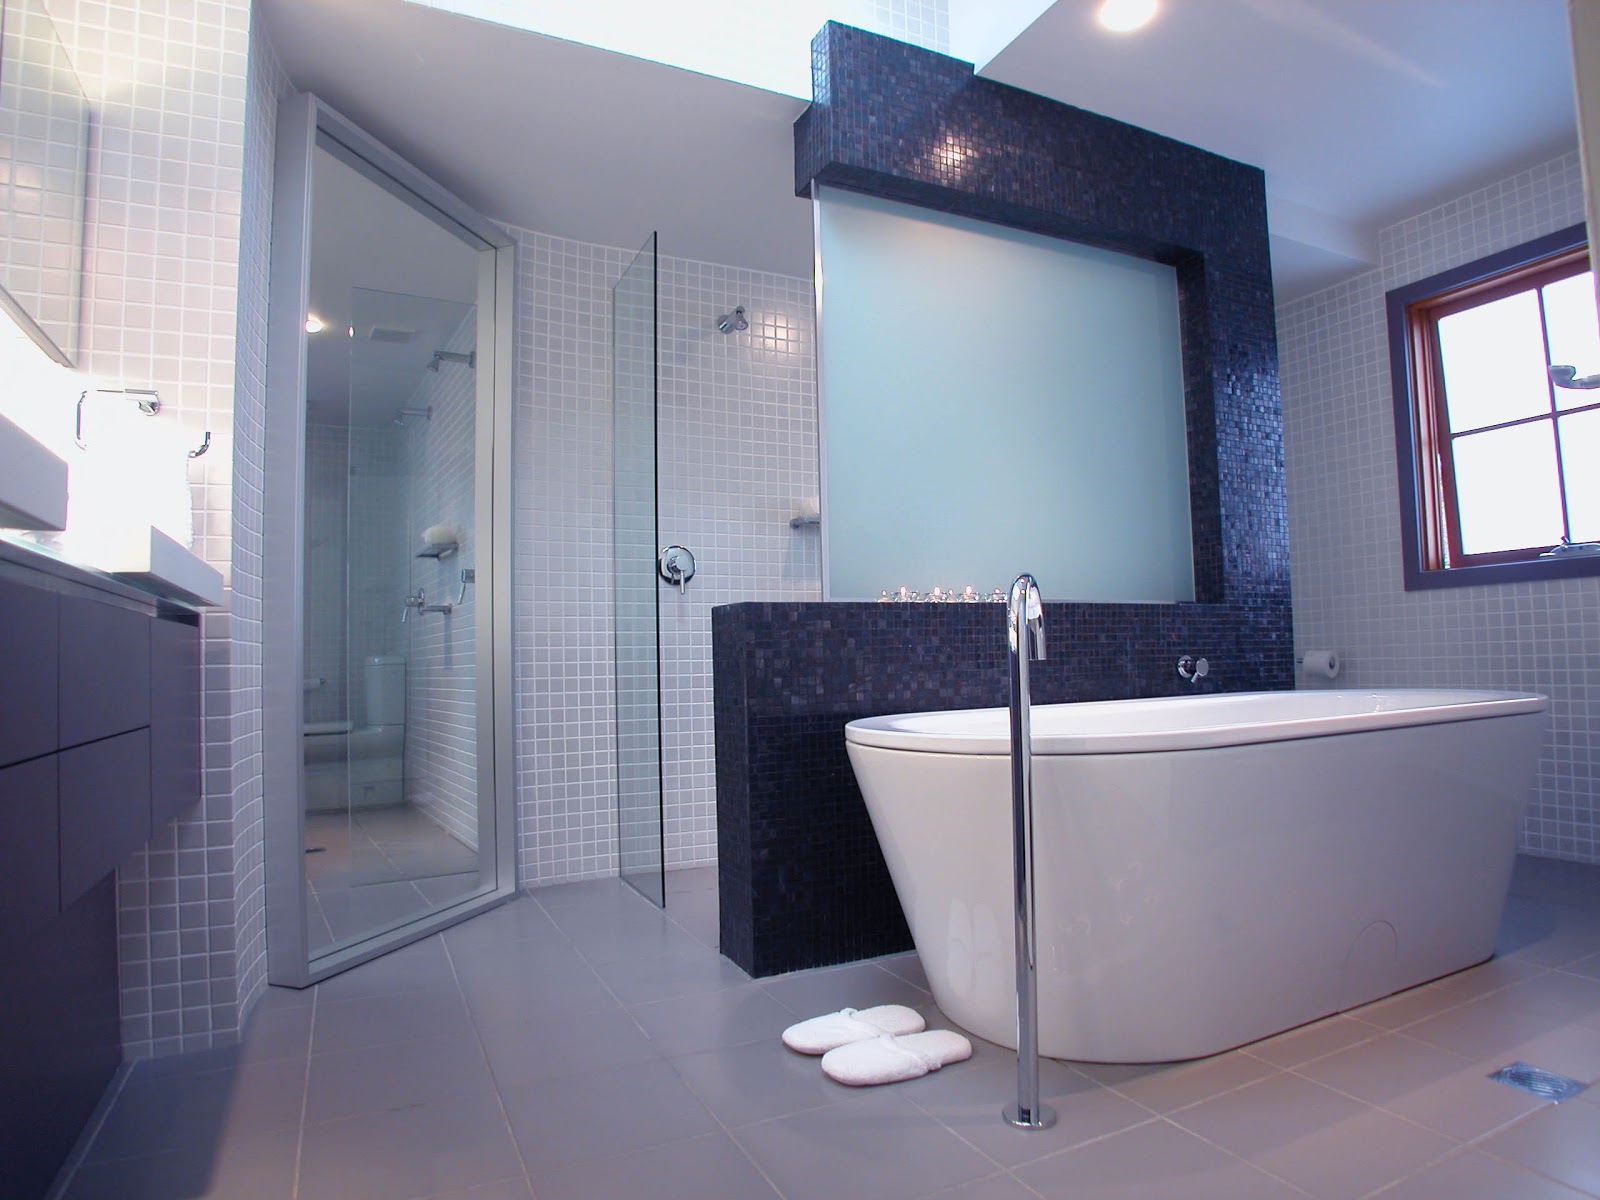 Minosa: Modern Main Bathroom designed to share.... on Main Bathroom Ideas  id=40882